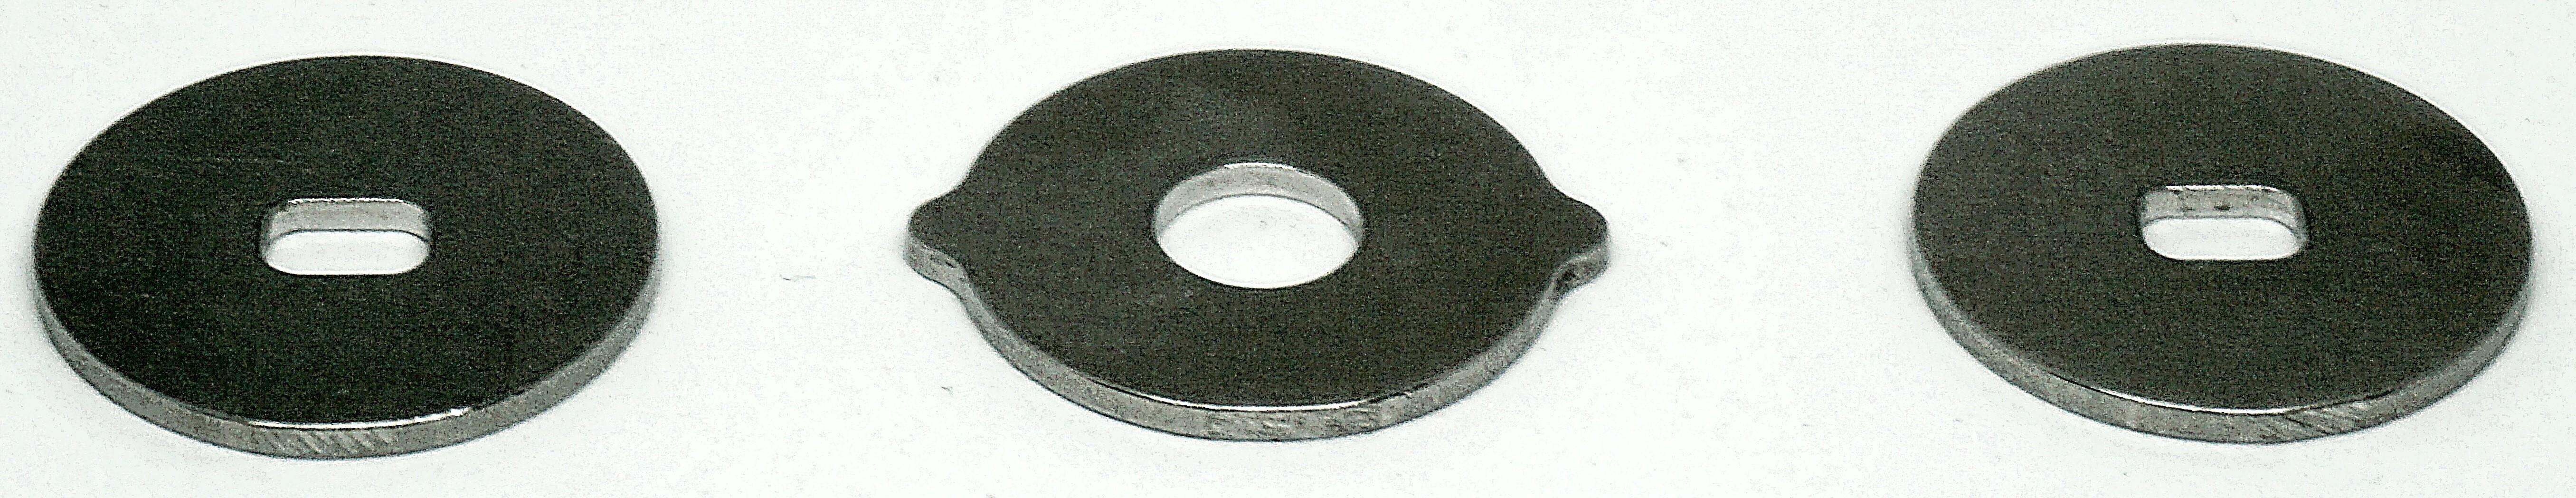 ALUMINUM FIBER WASHERS 28x10mm